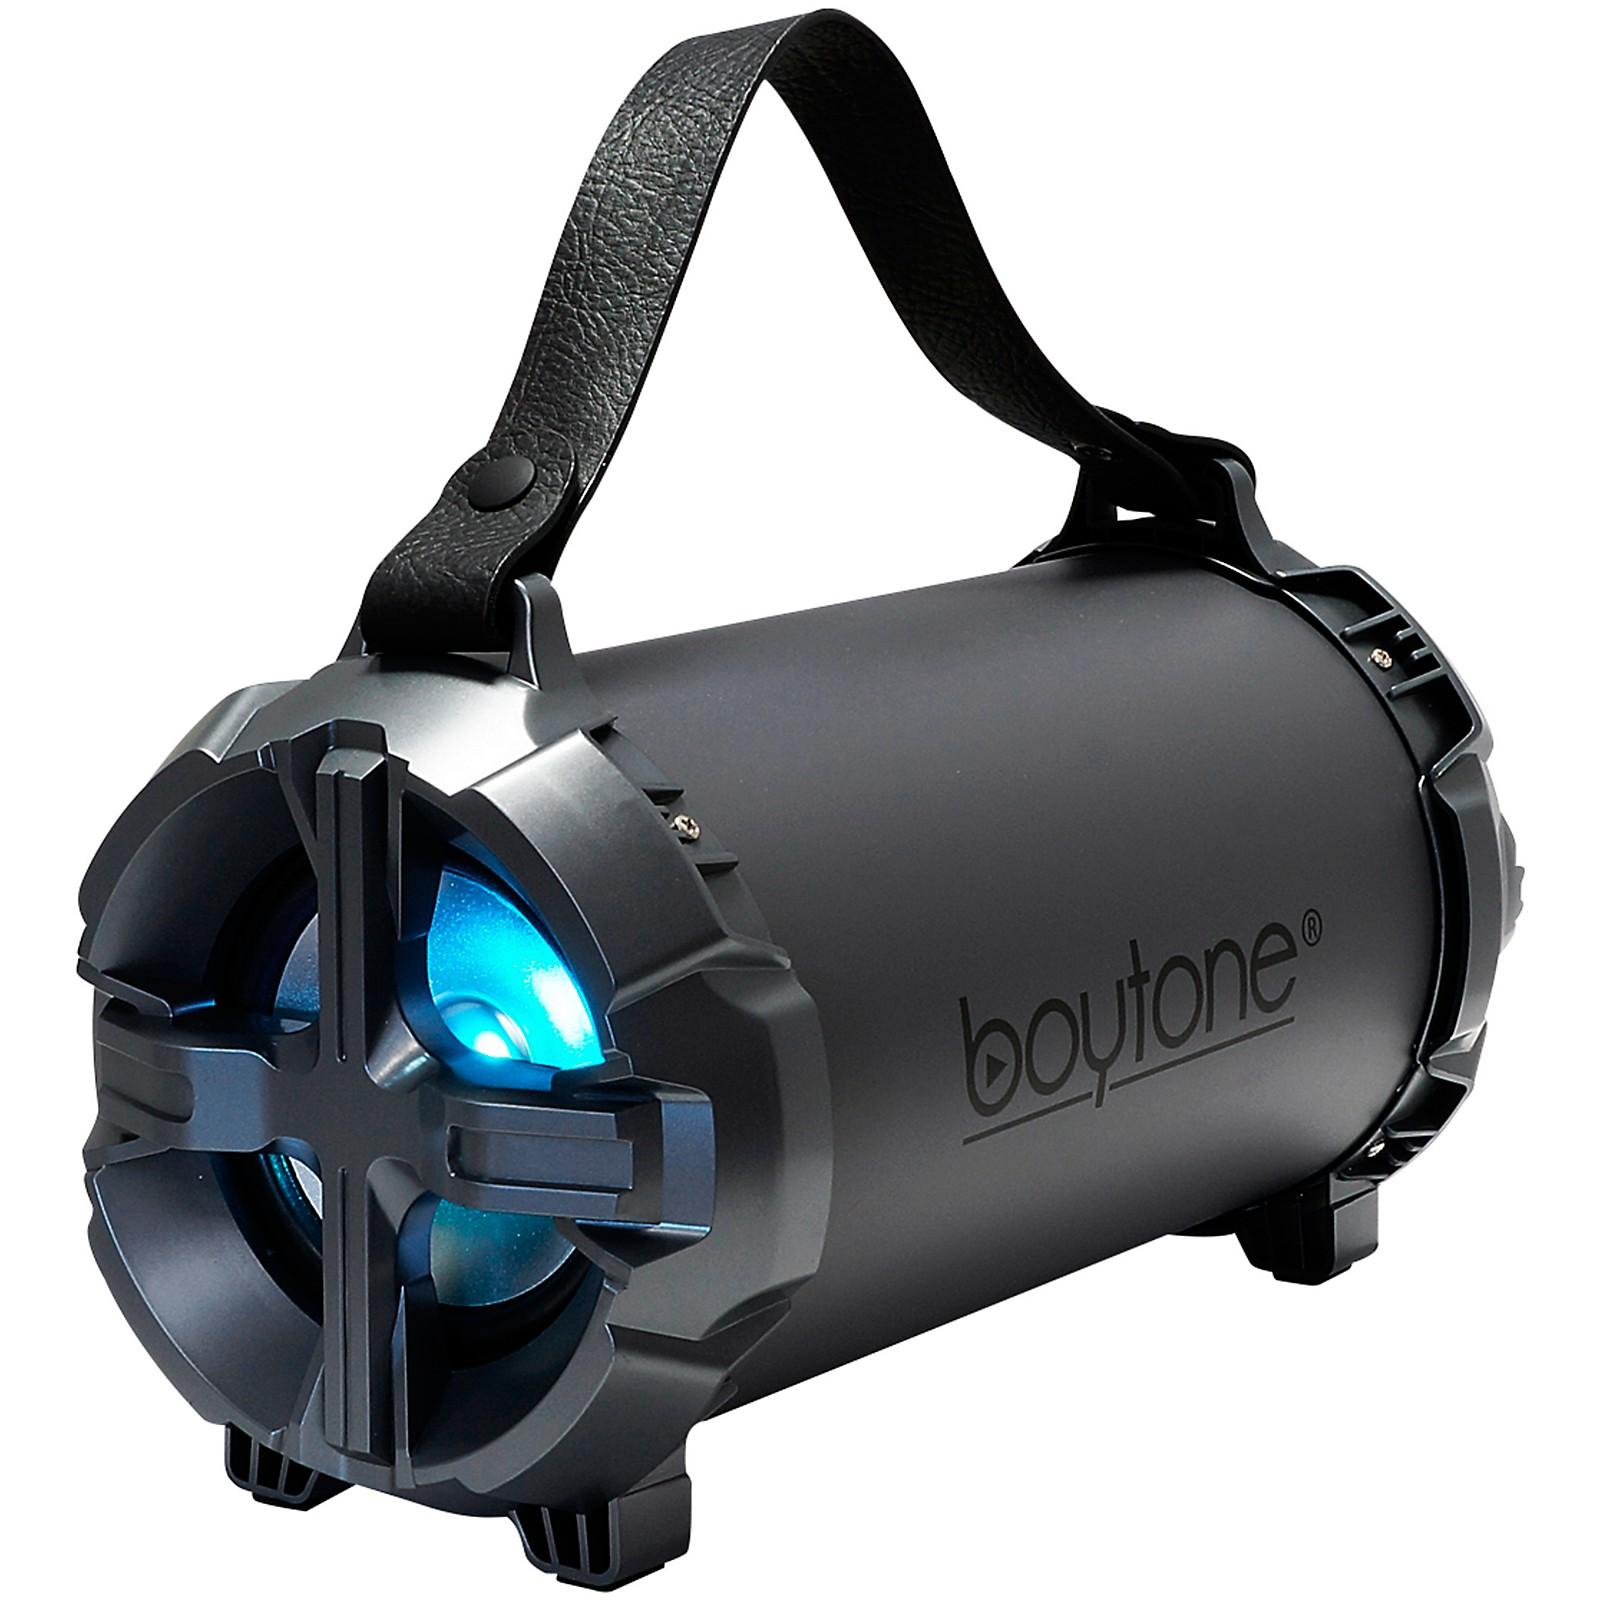 Boytone BT-44 Portable Bluetooth Hi-Fi Cylinder Speaker